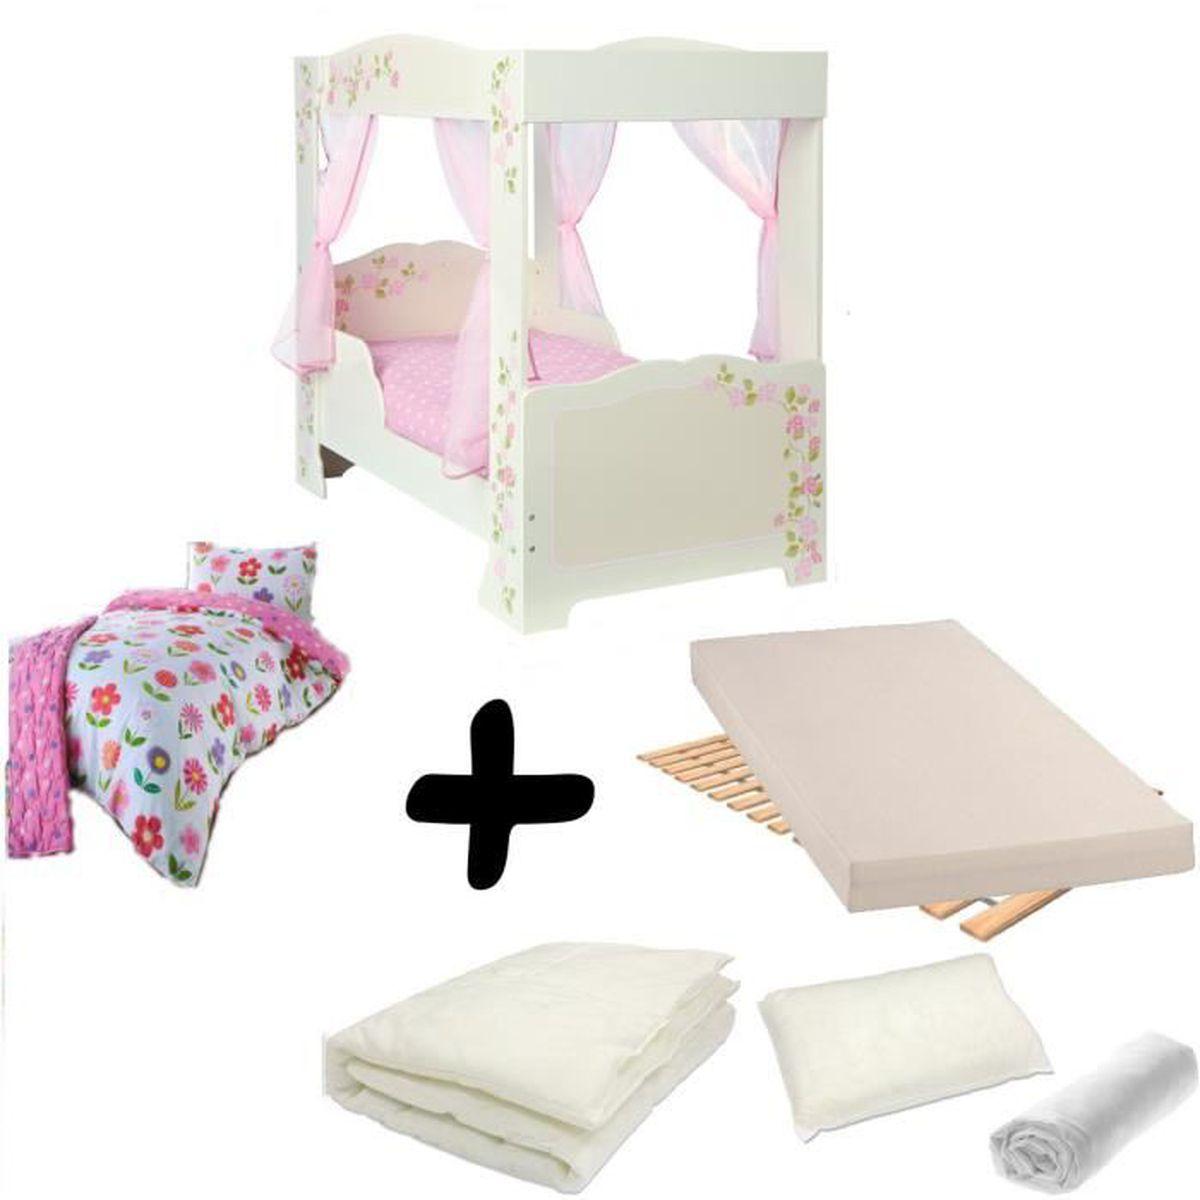 pack complet lit fille princesse baldaquin lit matelas parure couette oreiller rose. Black Bedroom Furniture Sets. Home Design Ideas